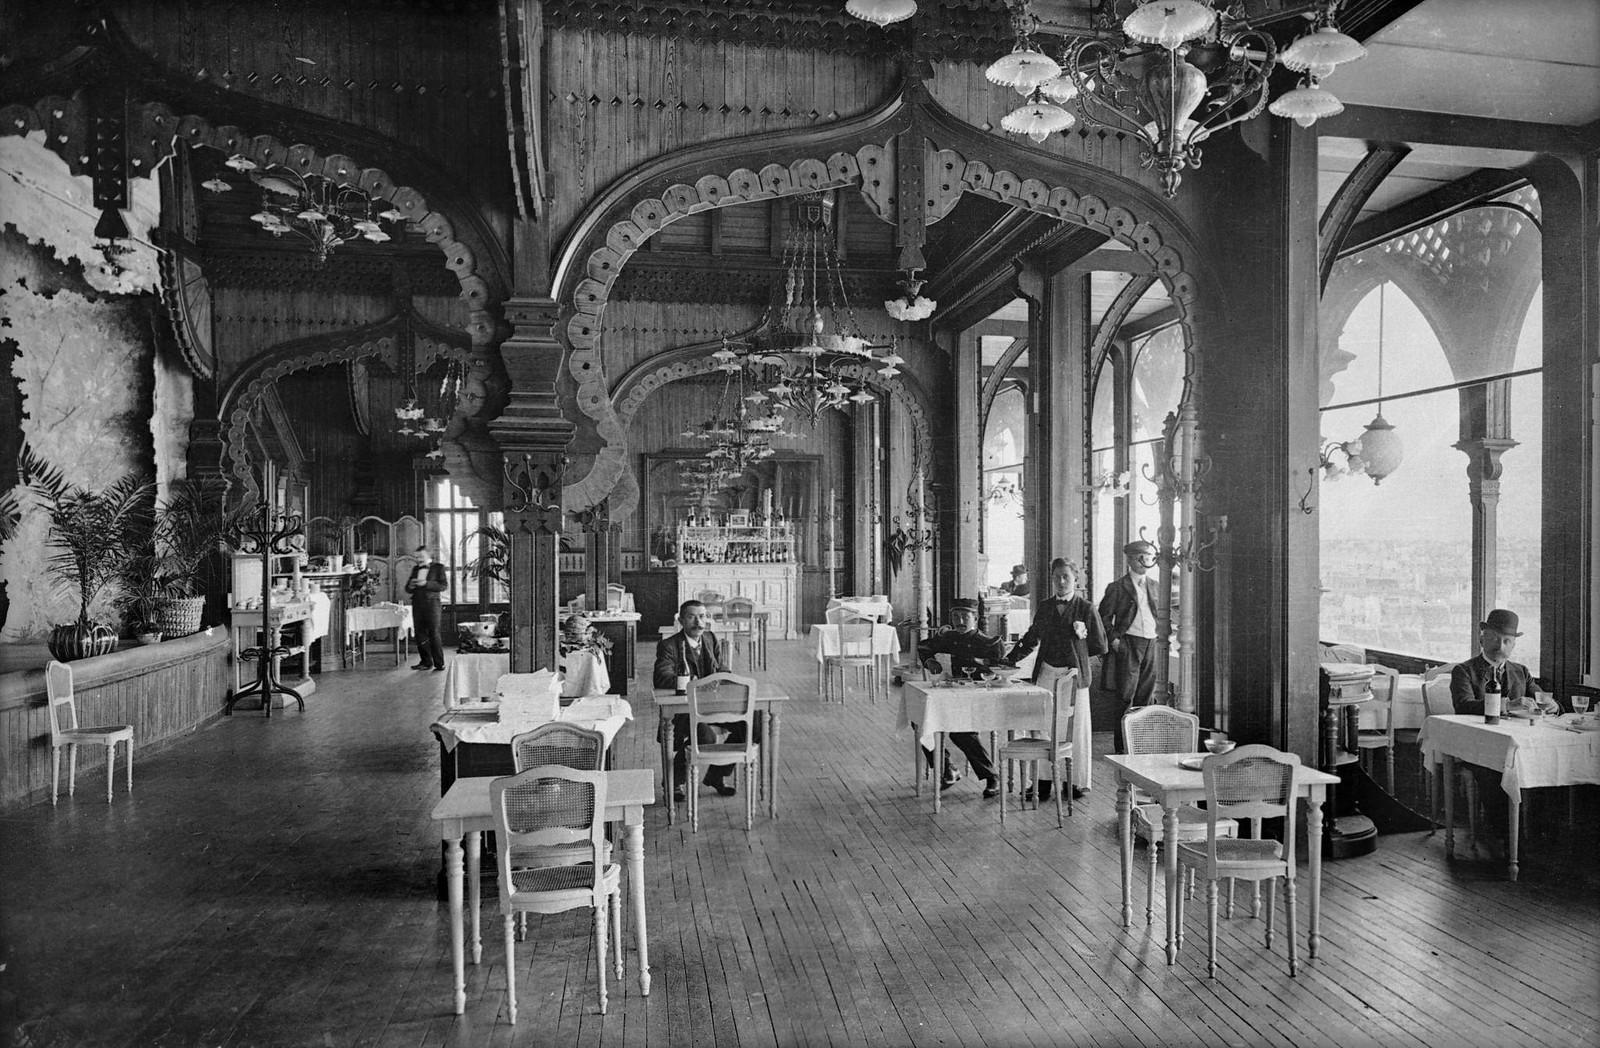 1900. Эйфелева башня. Зал ресторана